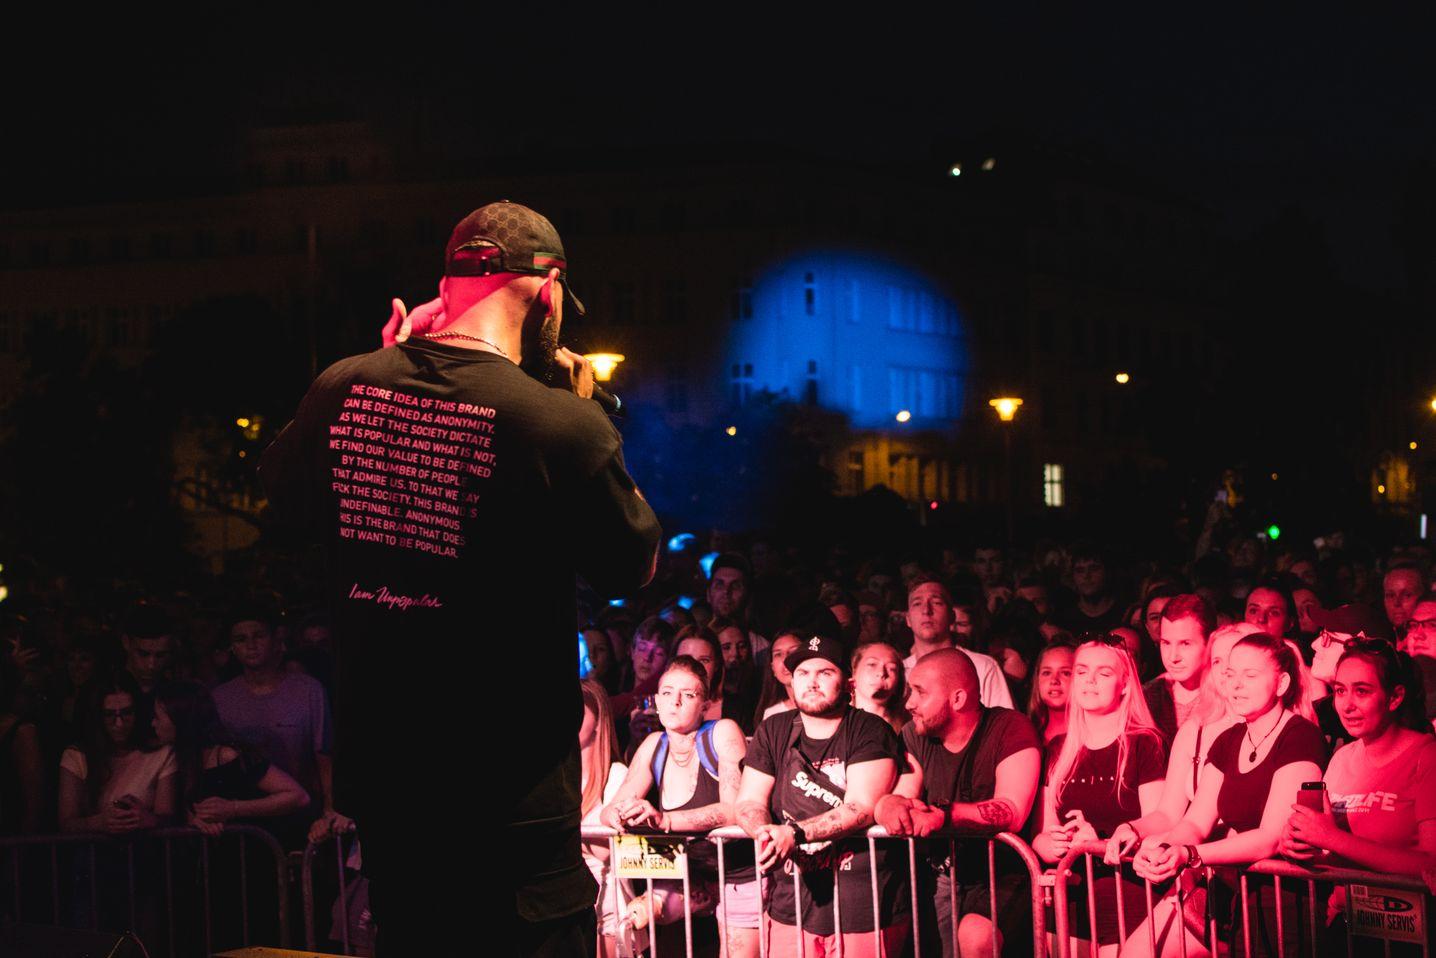 Uprostred-hiphop-srpen-Krezek-Jaroslav-3-.JPG